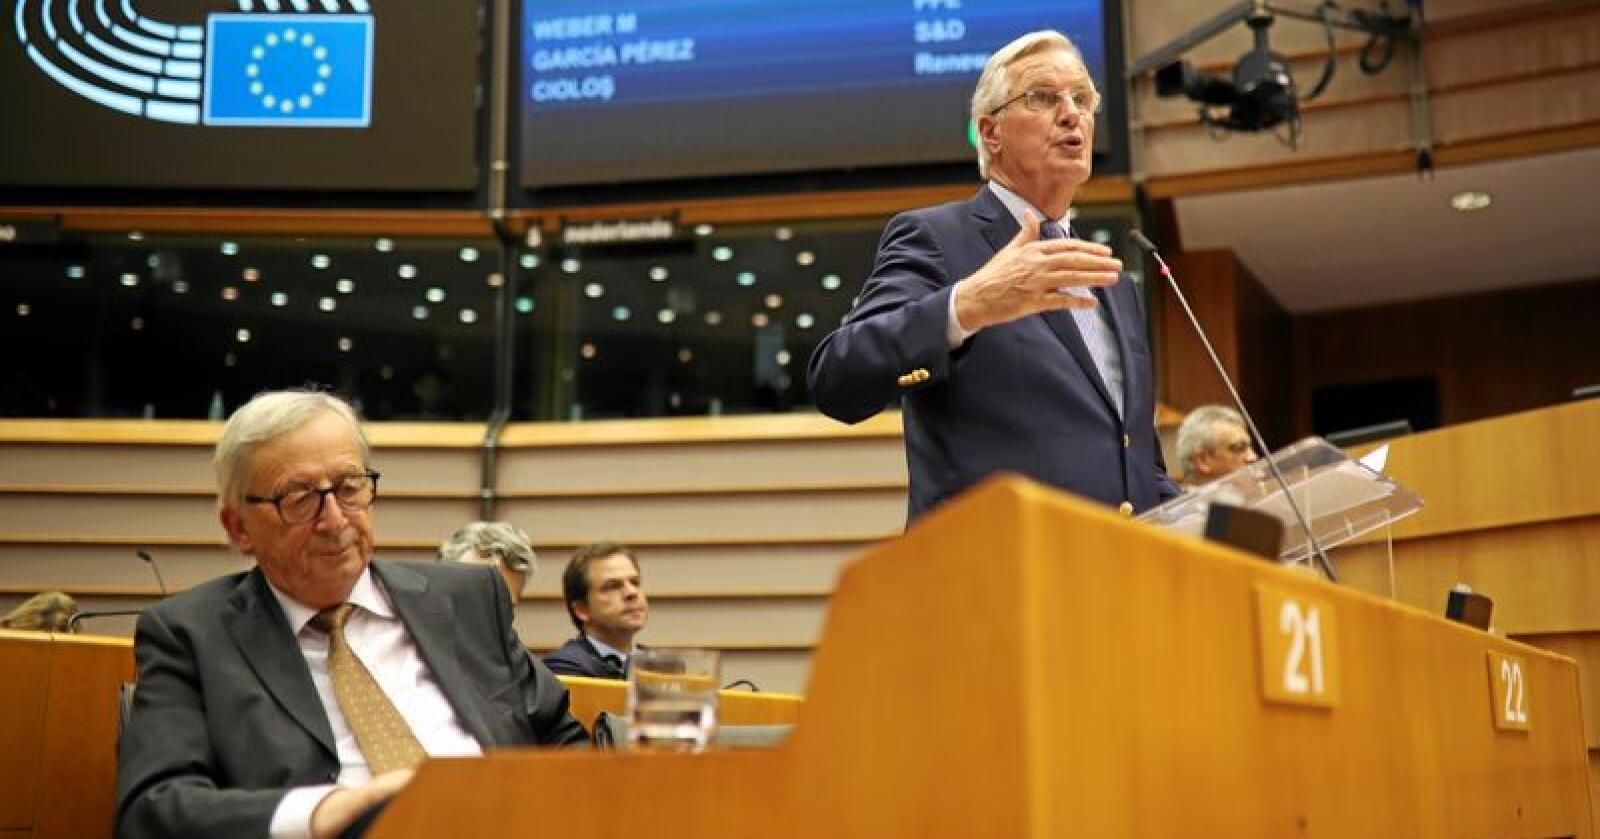 EUs Brexit-forhandler Michel Barnier (t.h.) på talerstolen i EU-parlamentet sammen med EUs avtroppende kommisjonspresident Jean-Claude Juncker. Foto: Francisco Seco / AP / NTB Scanpix